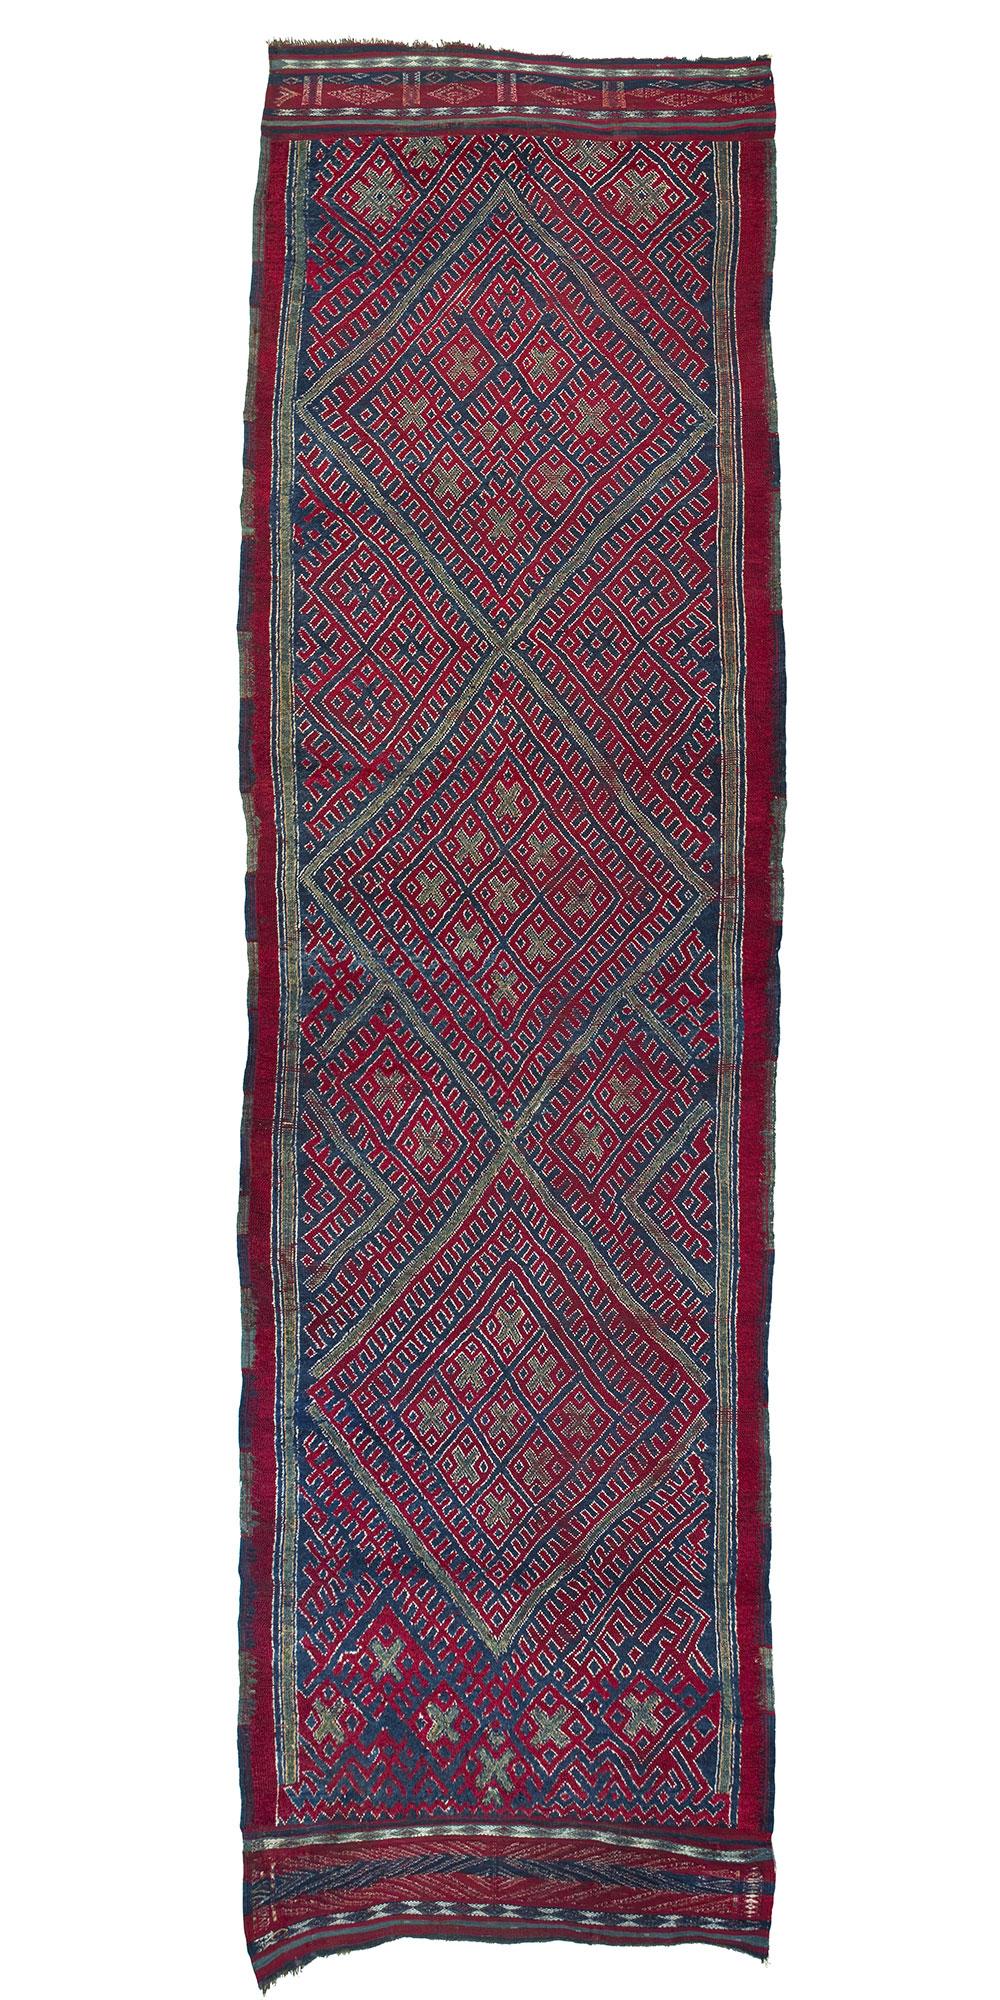 "Algerian Jebel Amour rug, 19th century or earlier. 1.65 x 5.50 m (5' 5"" x8'). In association Gebhart Blazek, Graz/Alberto Levi Gallery, Milan"